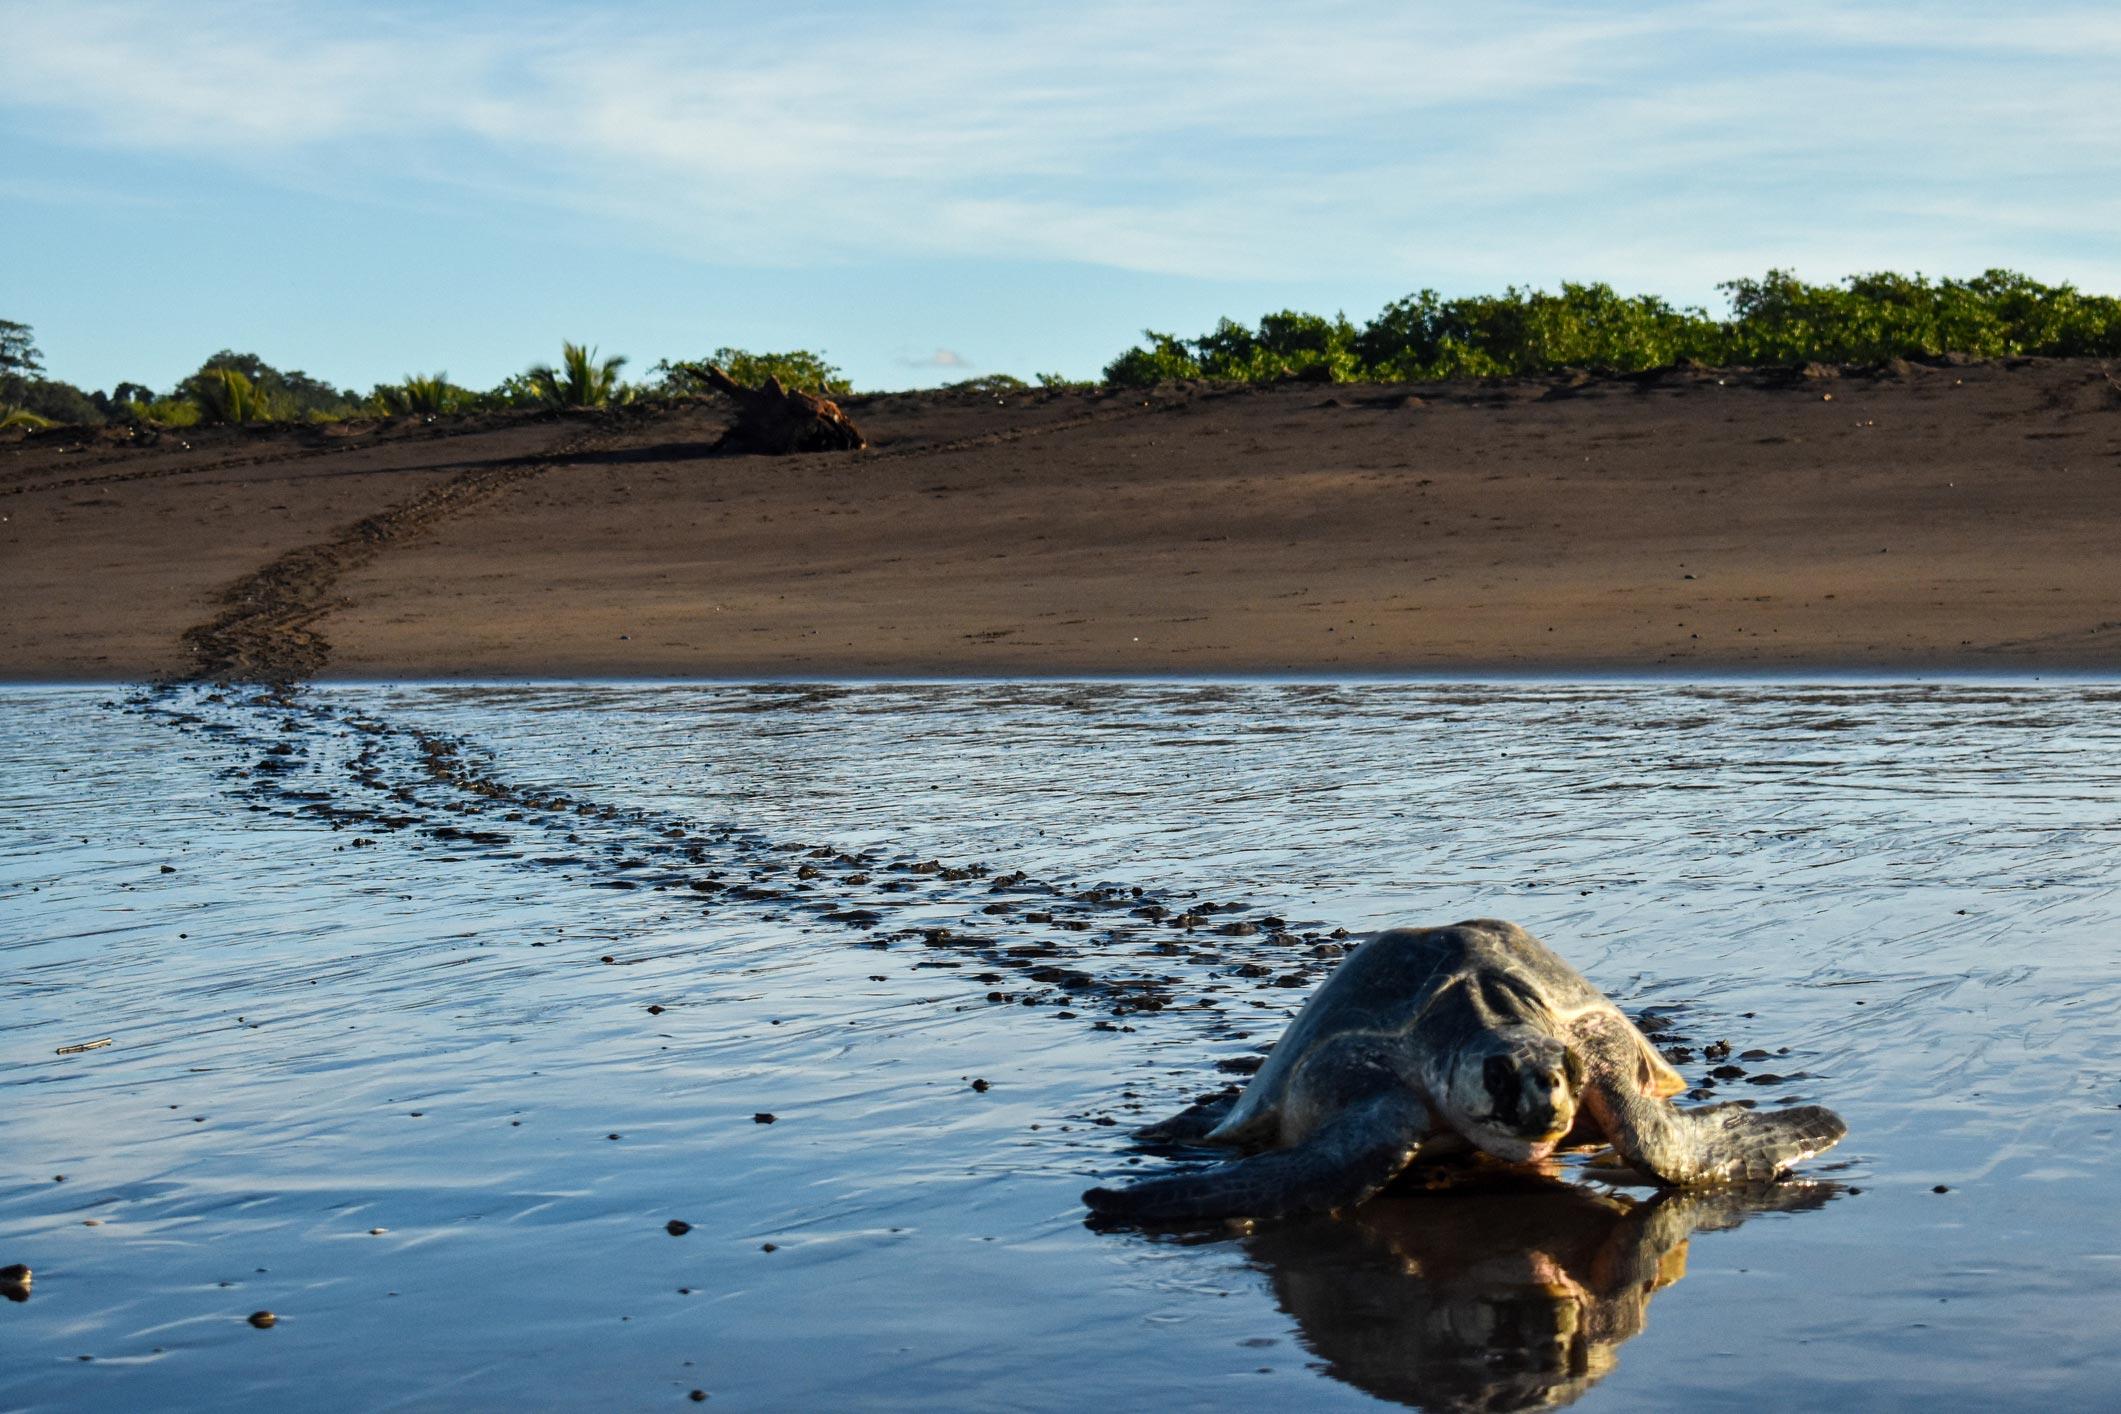 sea turtle heading to the ocean